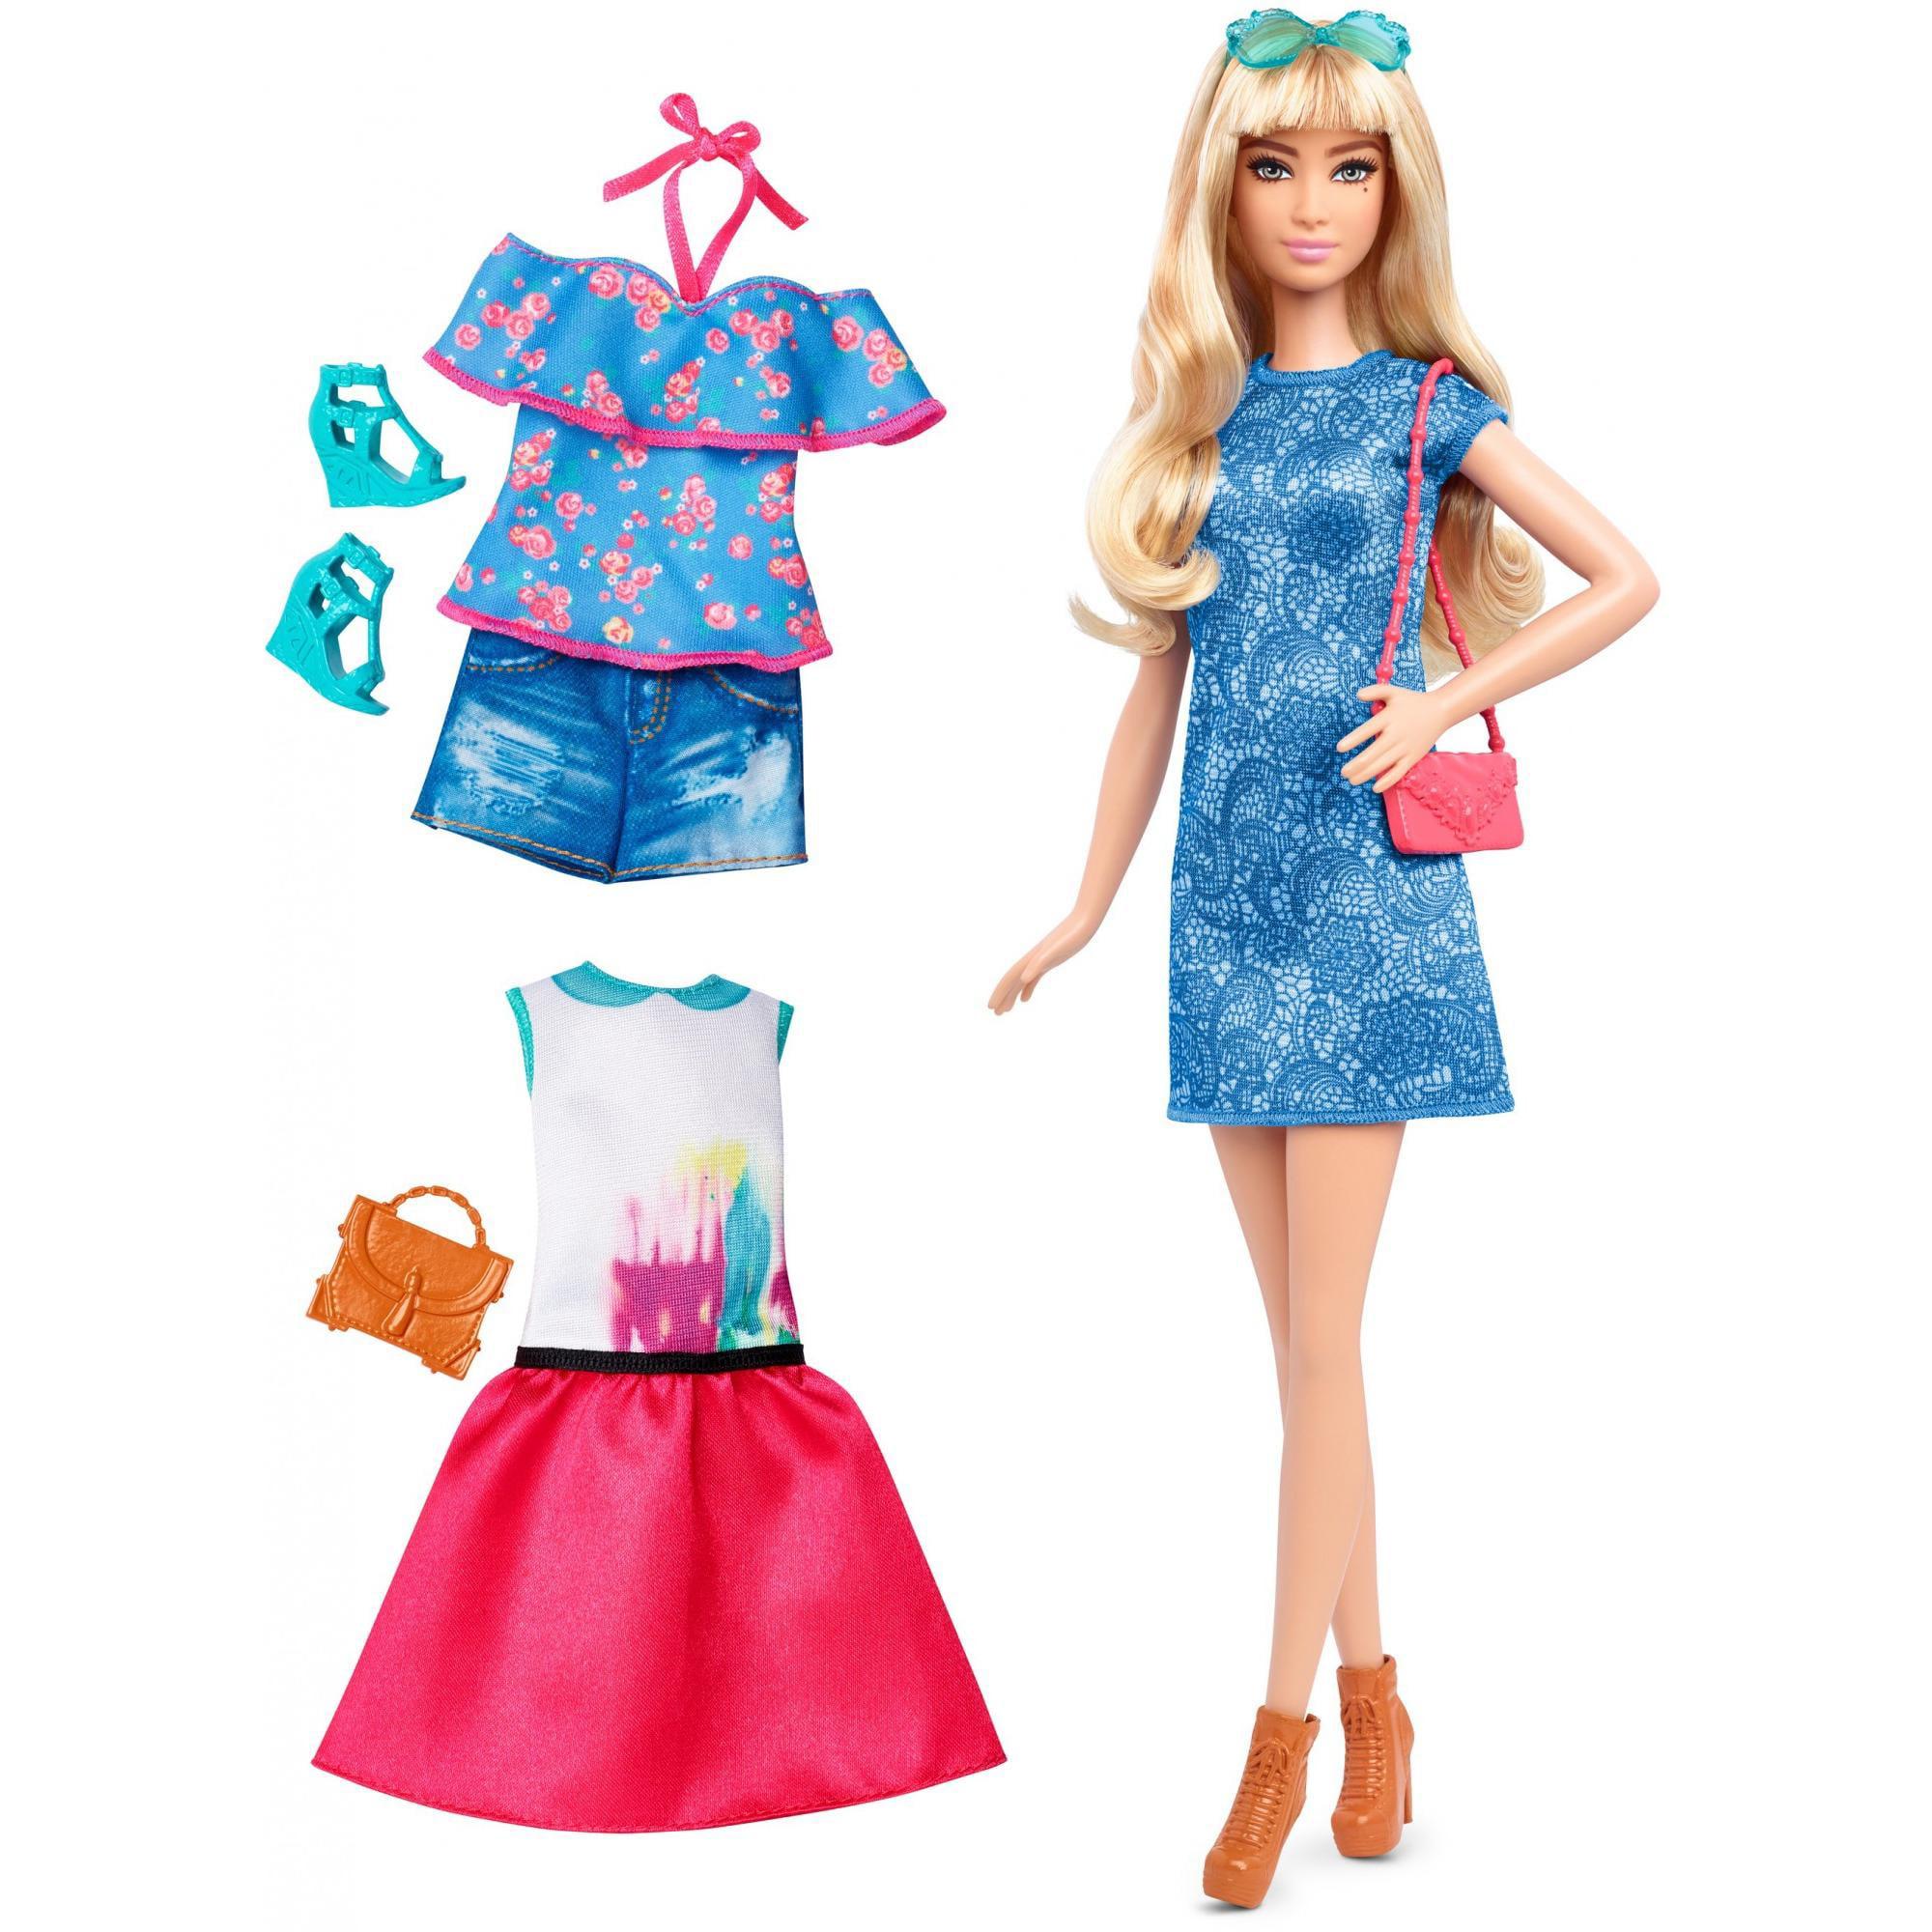 Barbie Lacey Blue Fashionista Gift Set by MATTEL INC.